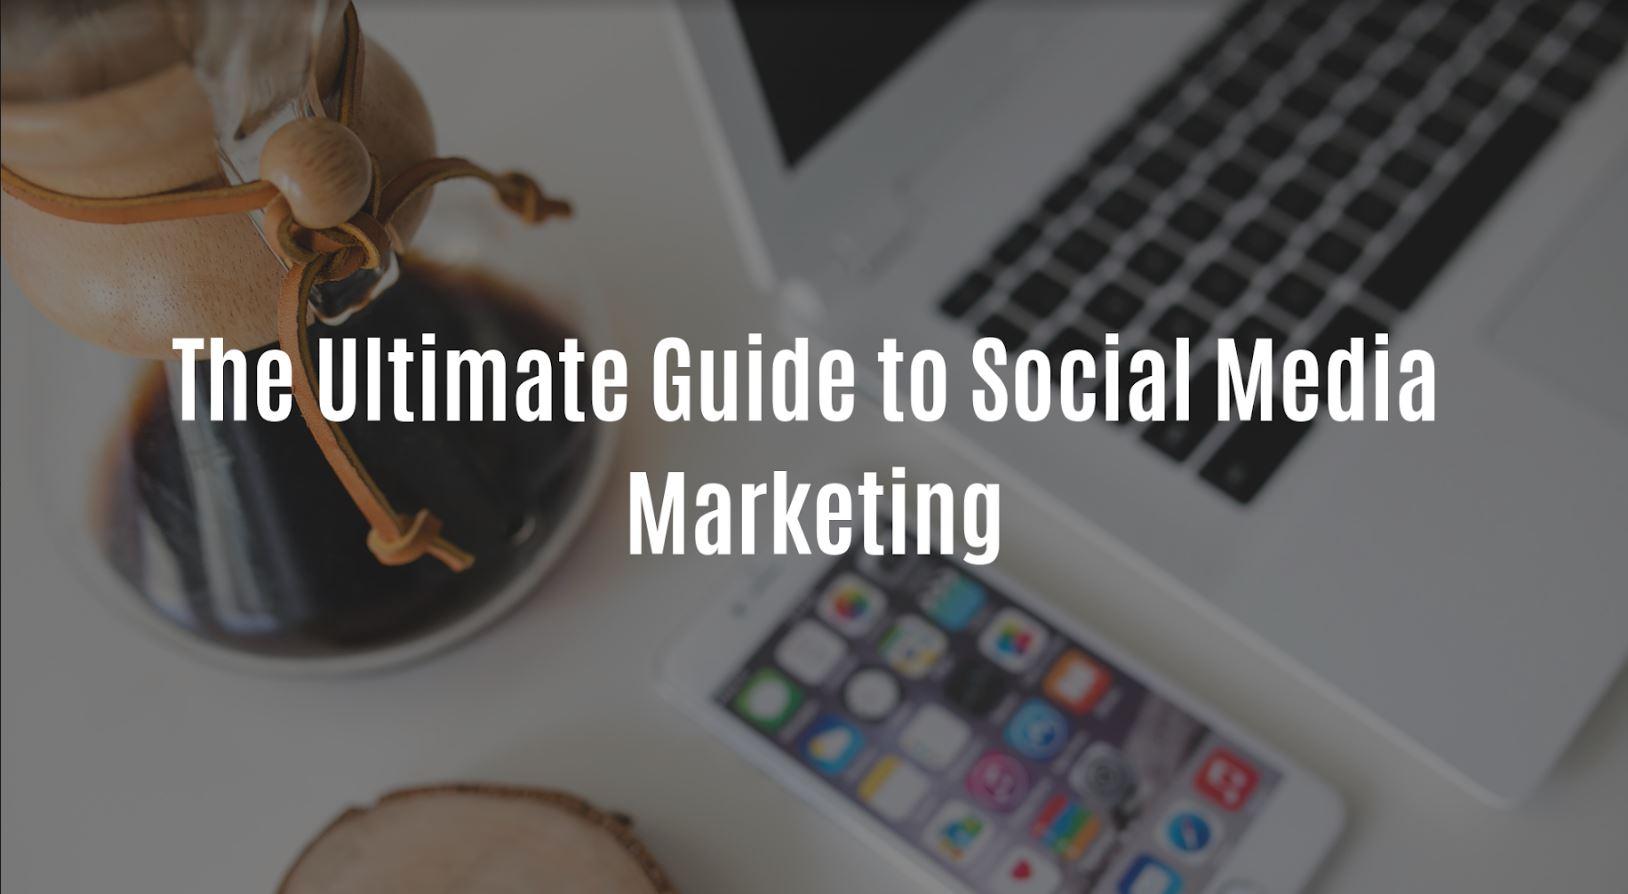 The Ultimate Guide to Social Media Marketing.JPG